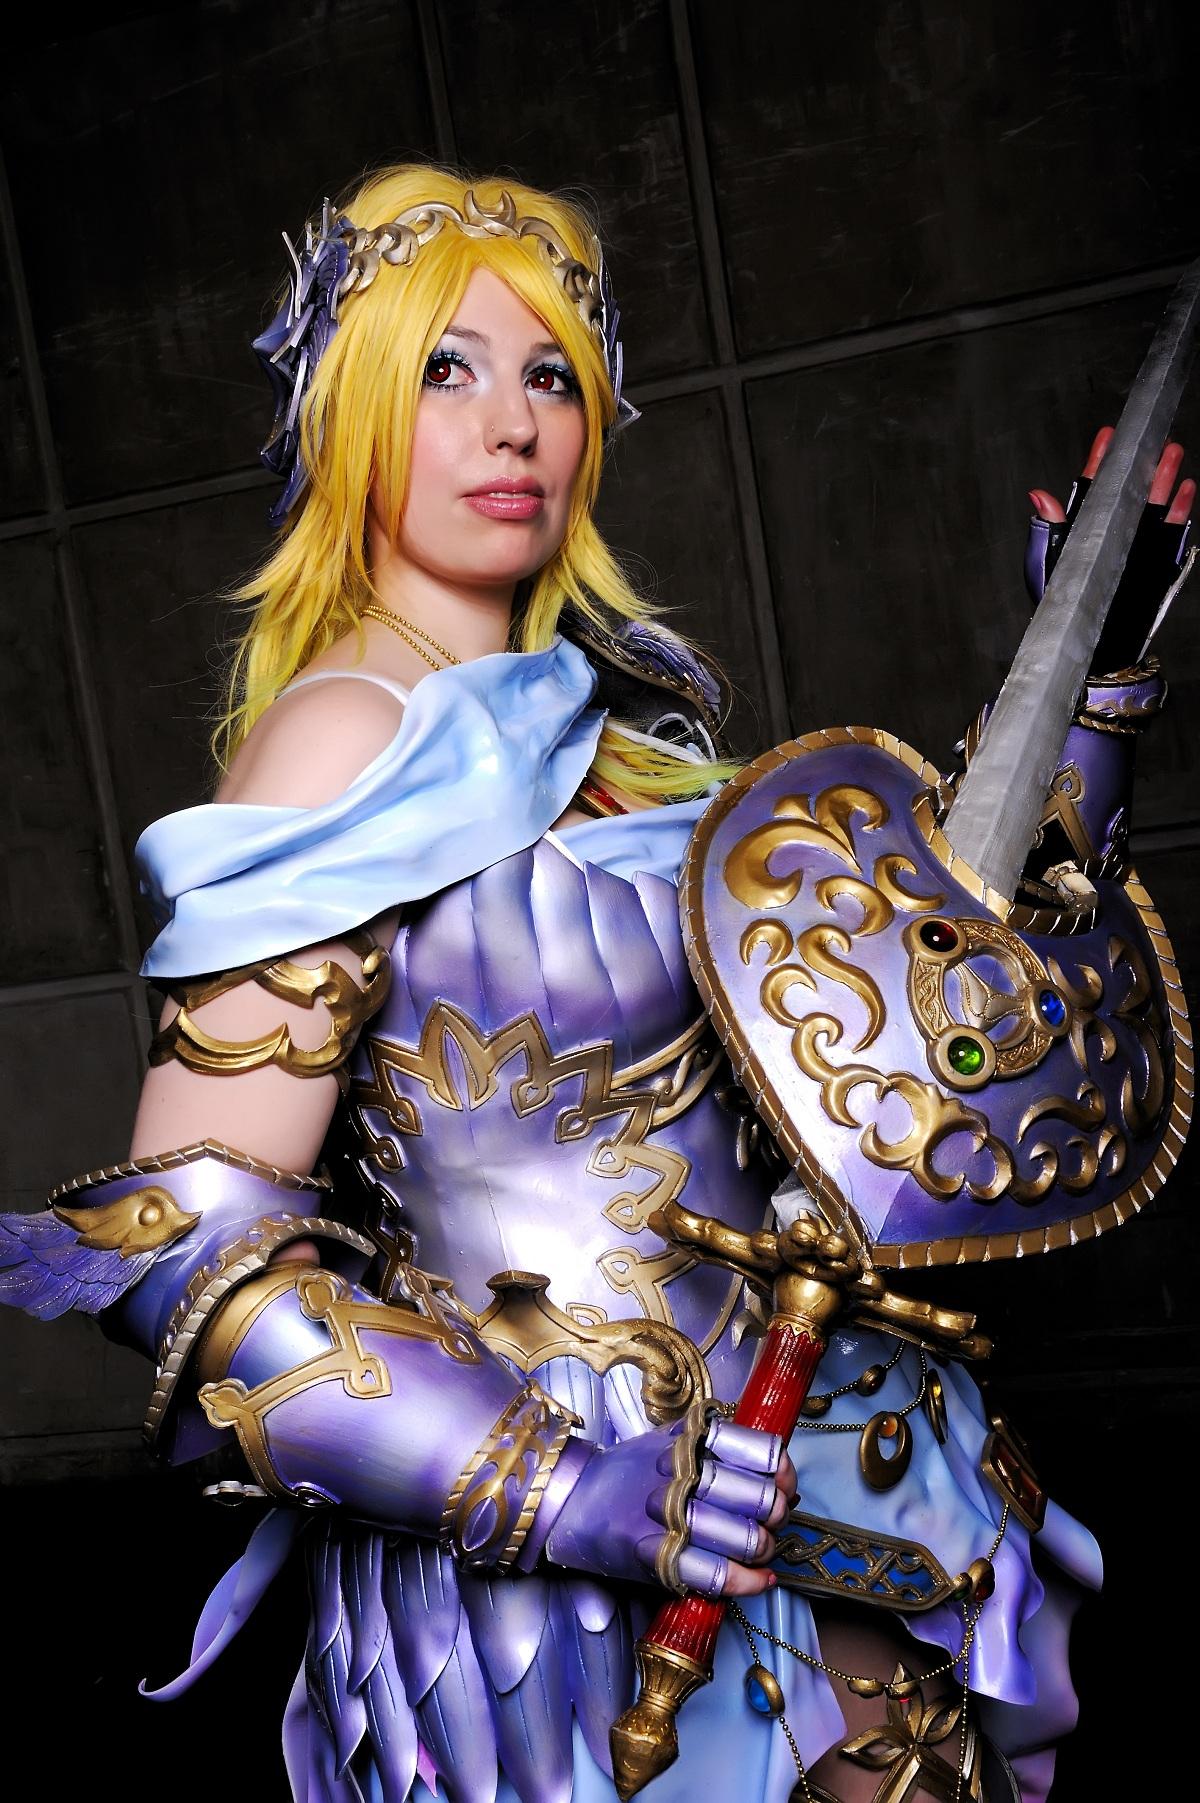 Nữ kiếm sĩ xinh đẹp trong Zangeki no Reginleiv - Ảnh 3